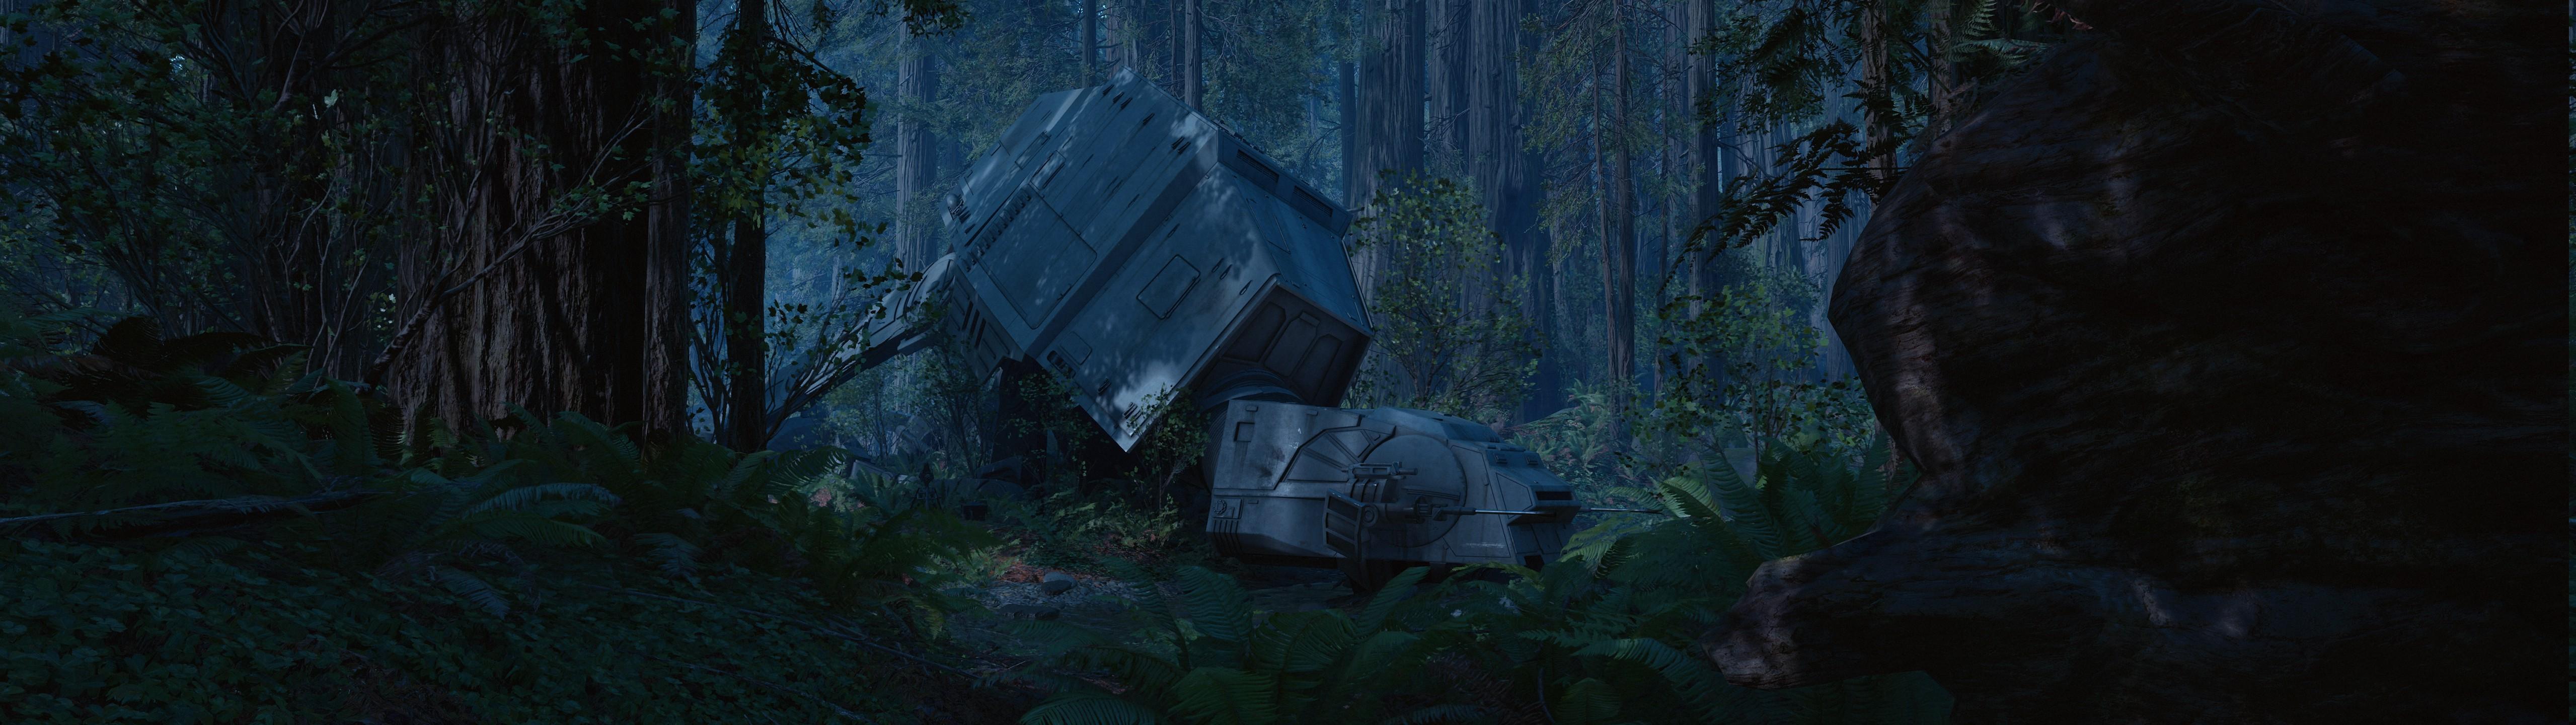 Wallpaper Landscape Star Wars Video Games Rock Grass Sky